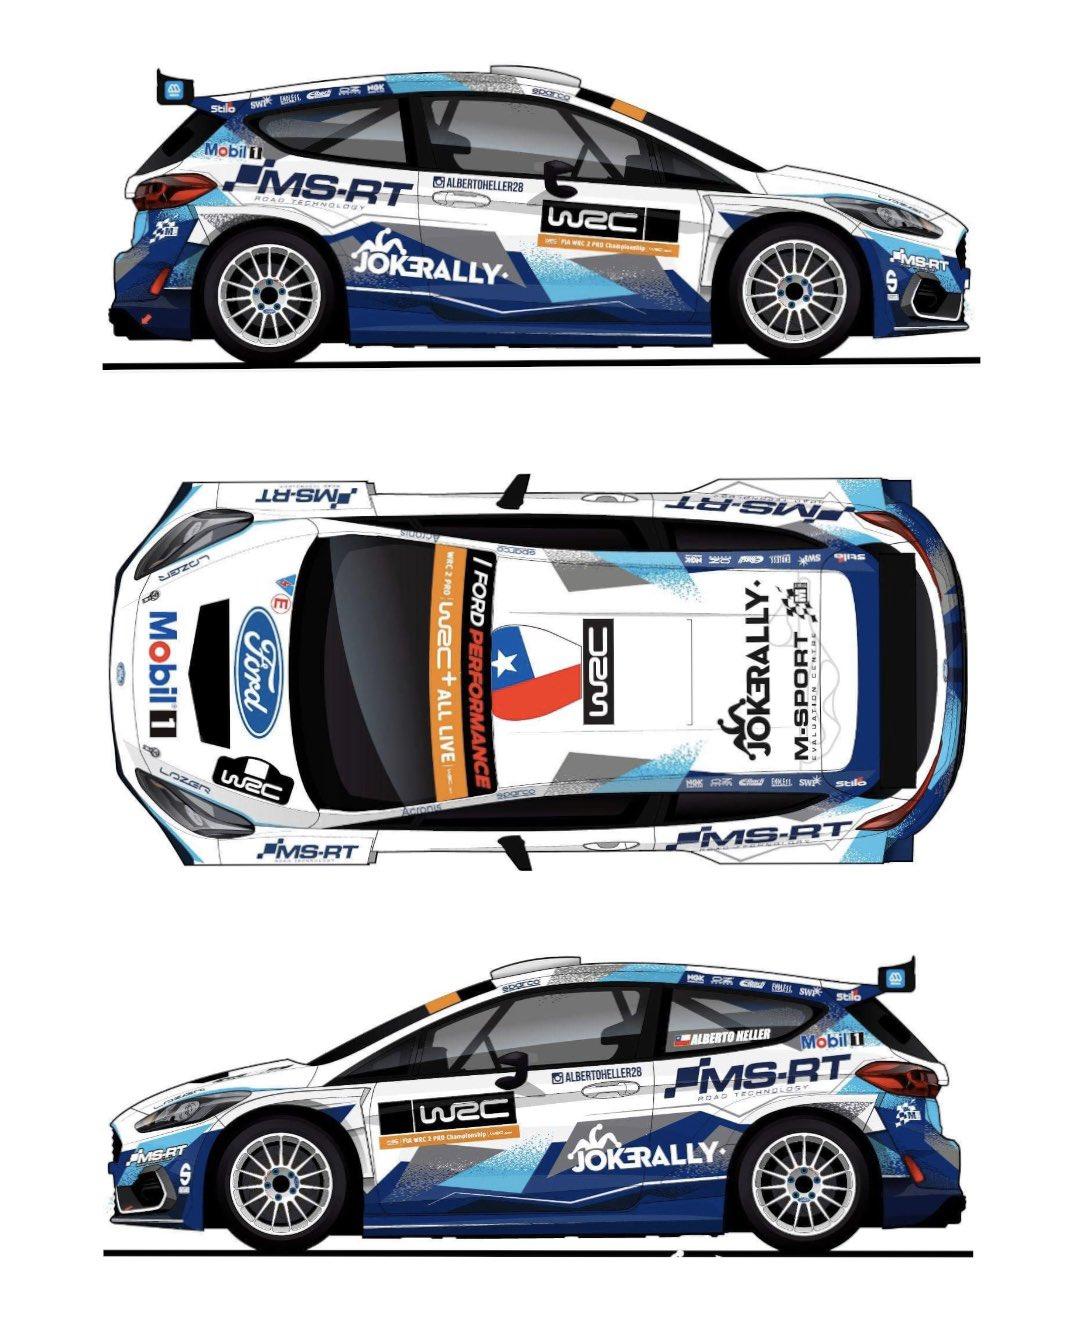 World Rally Championship: Temporada 2020 - Página 12 ERN1y5pU0AErUJv?format=jpg&name=large